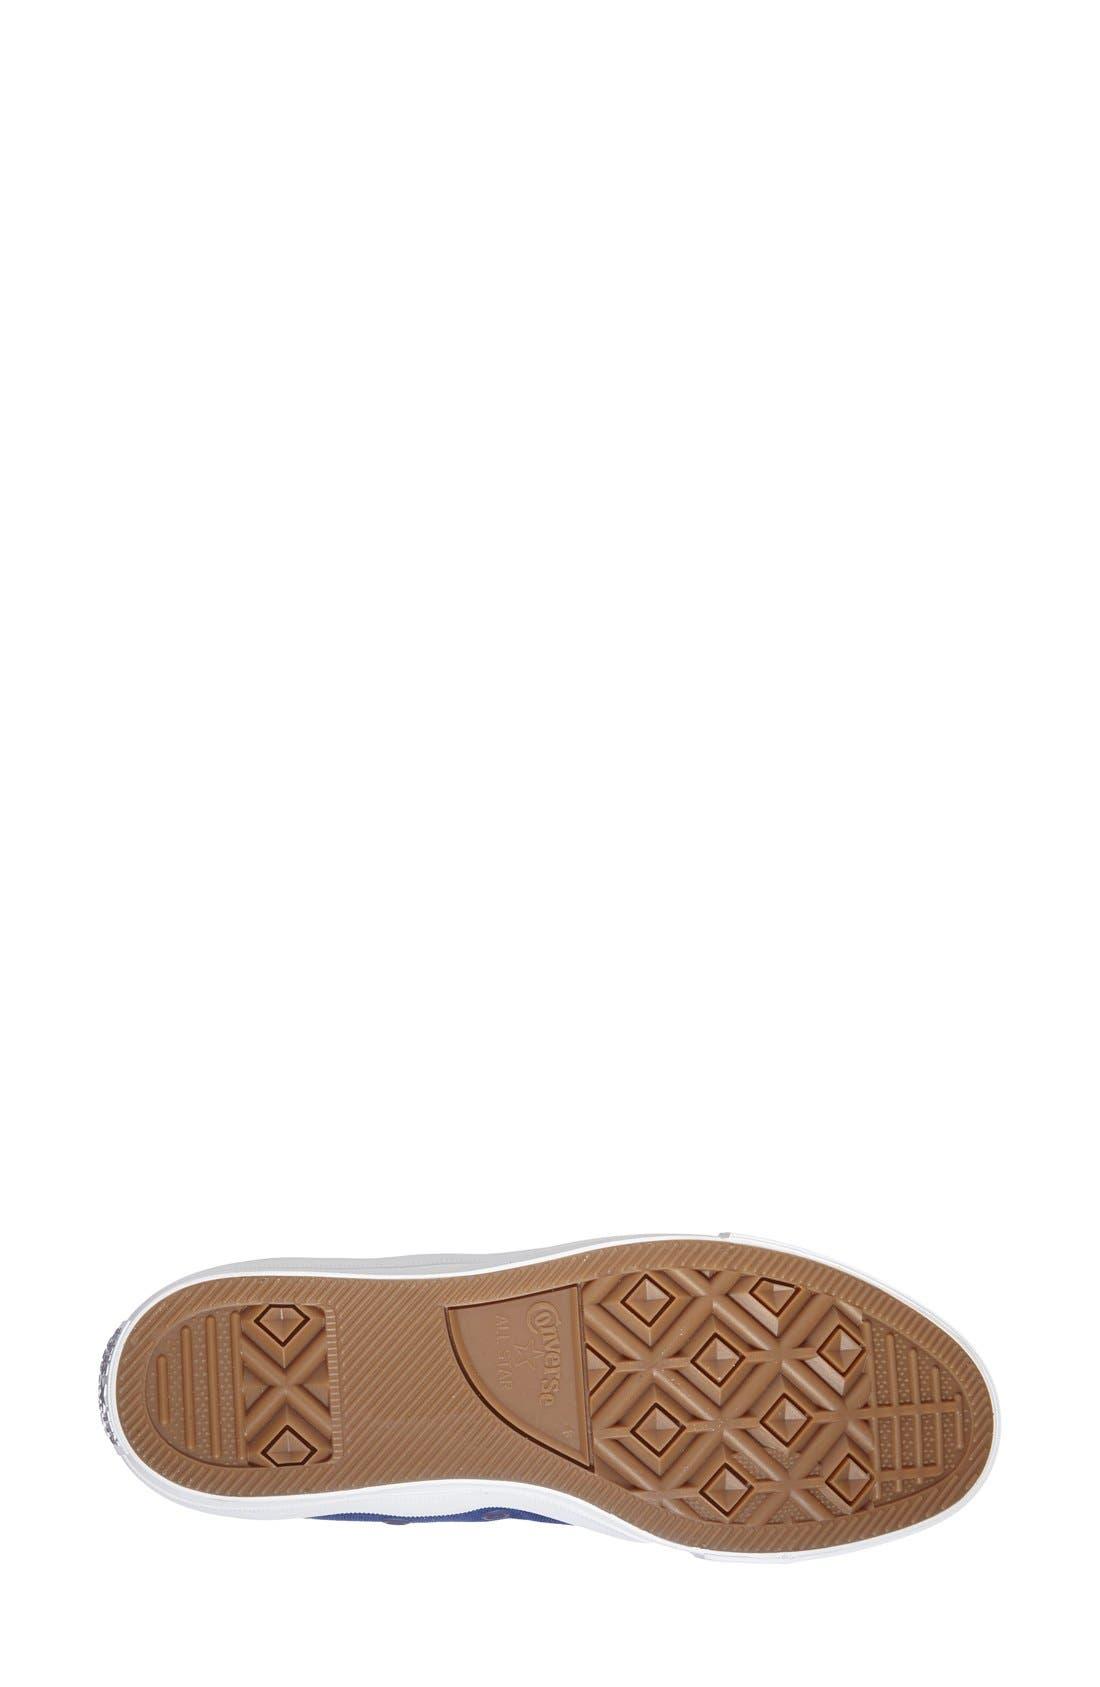 Alternate Image 4  - Converse Chuck Taylor® All Star® 'Chuck II' High Top Sneaker (Women) (Regular Retail Price: $74.95)